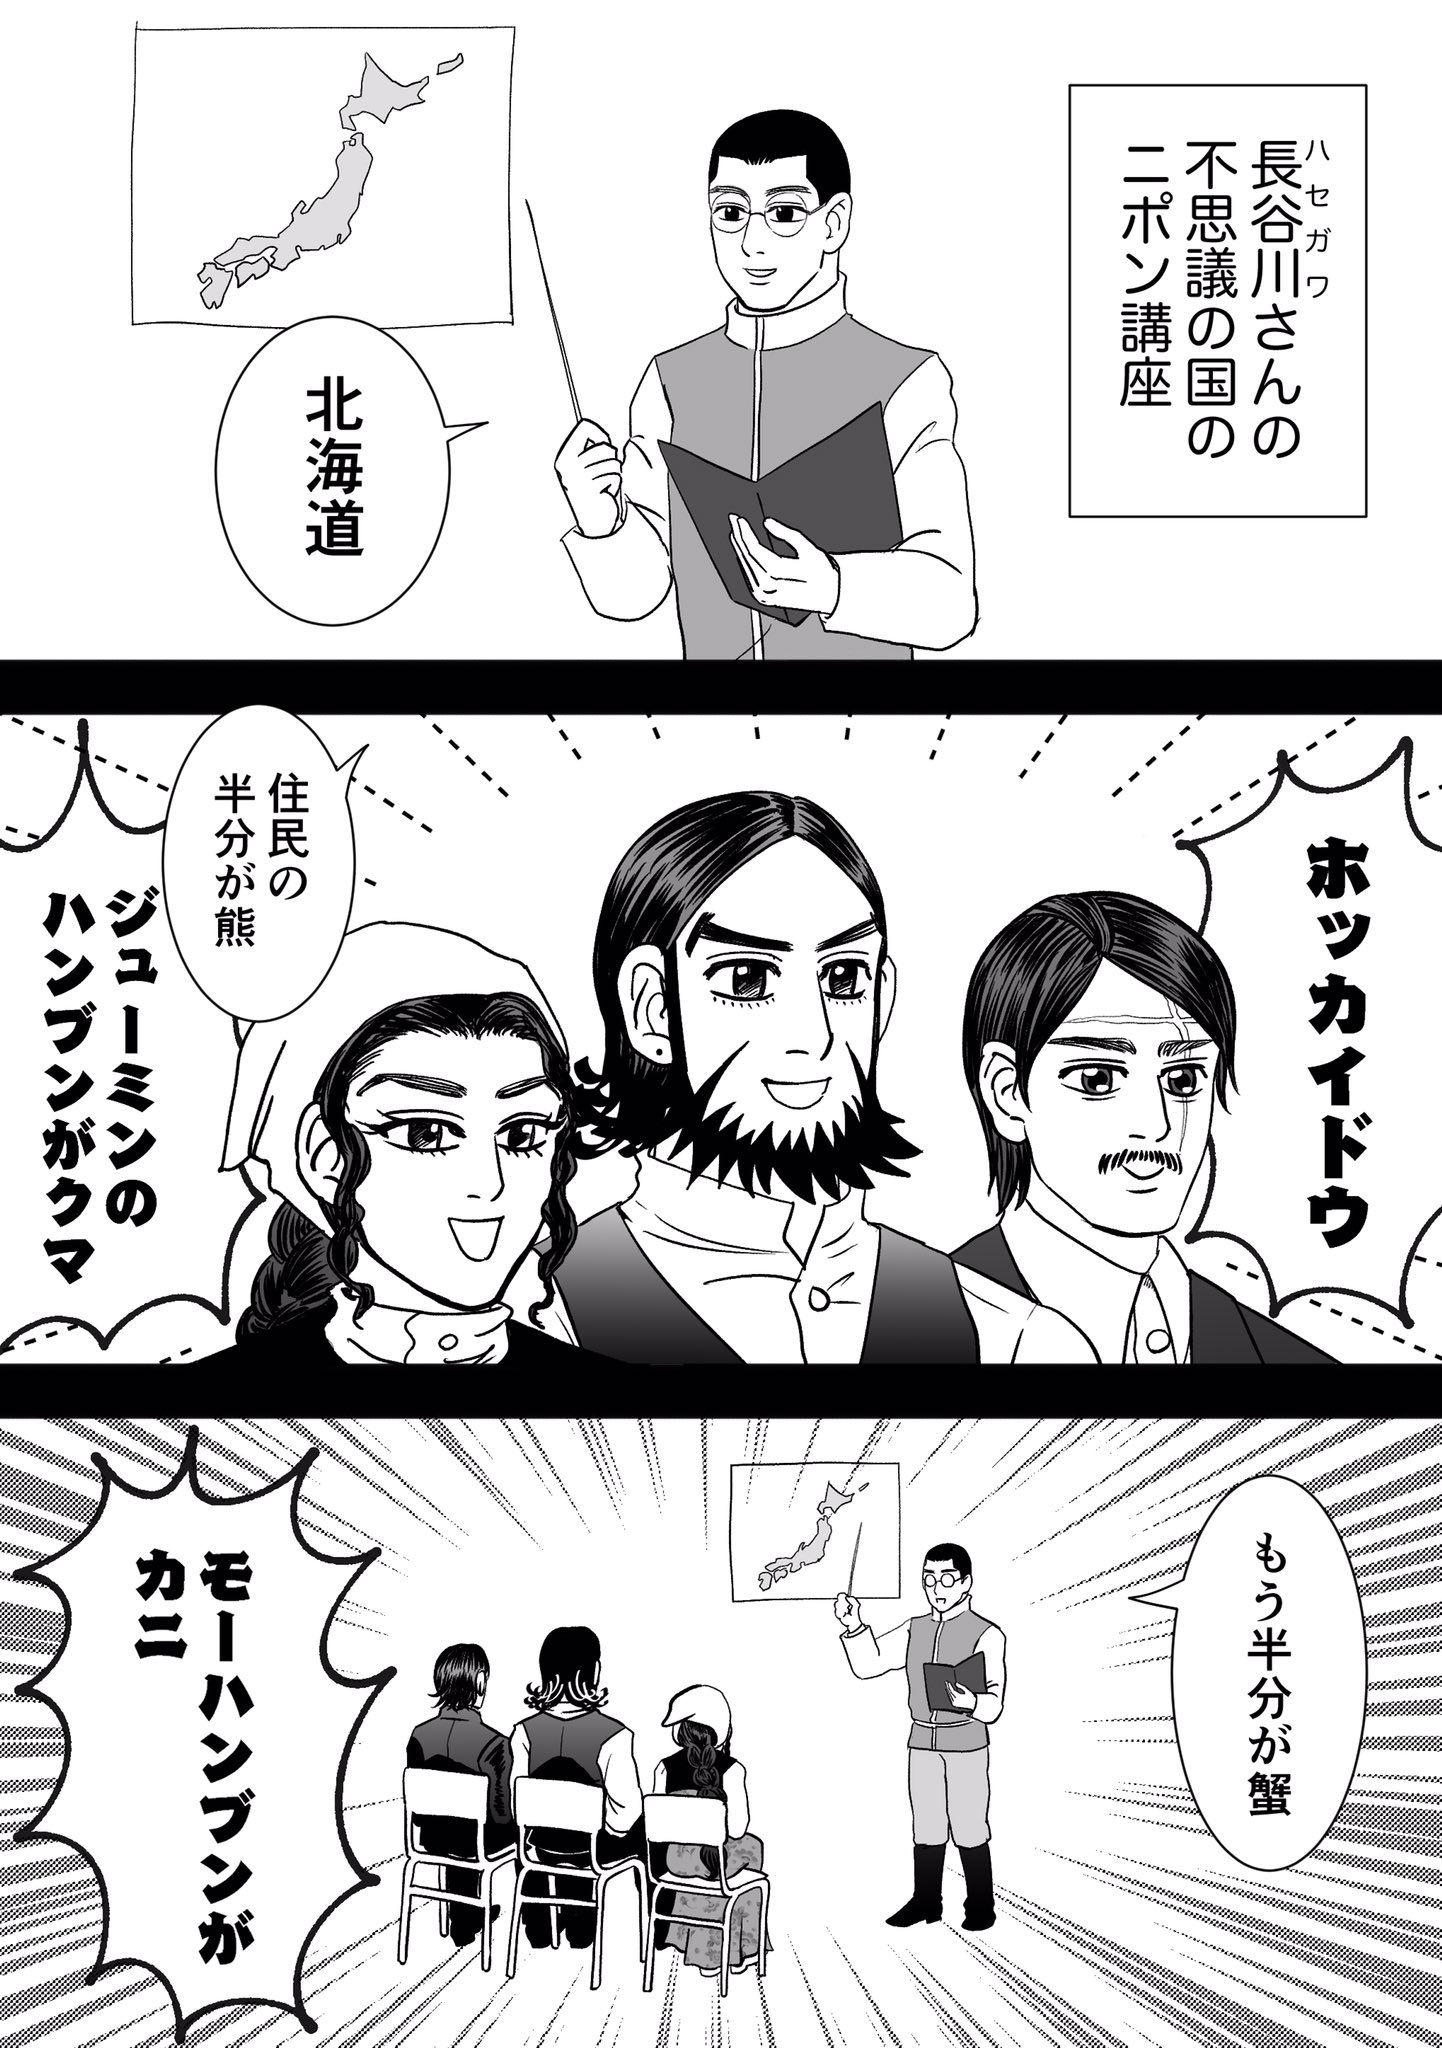 twitter manga poster art